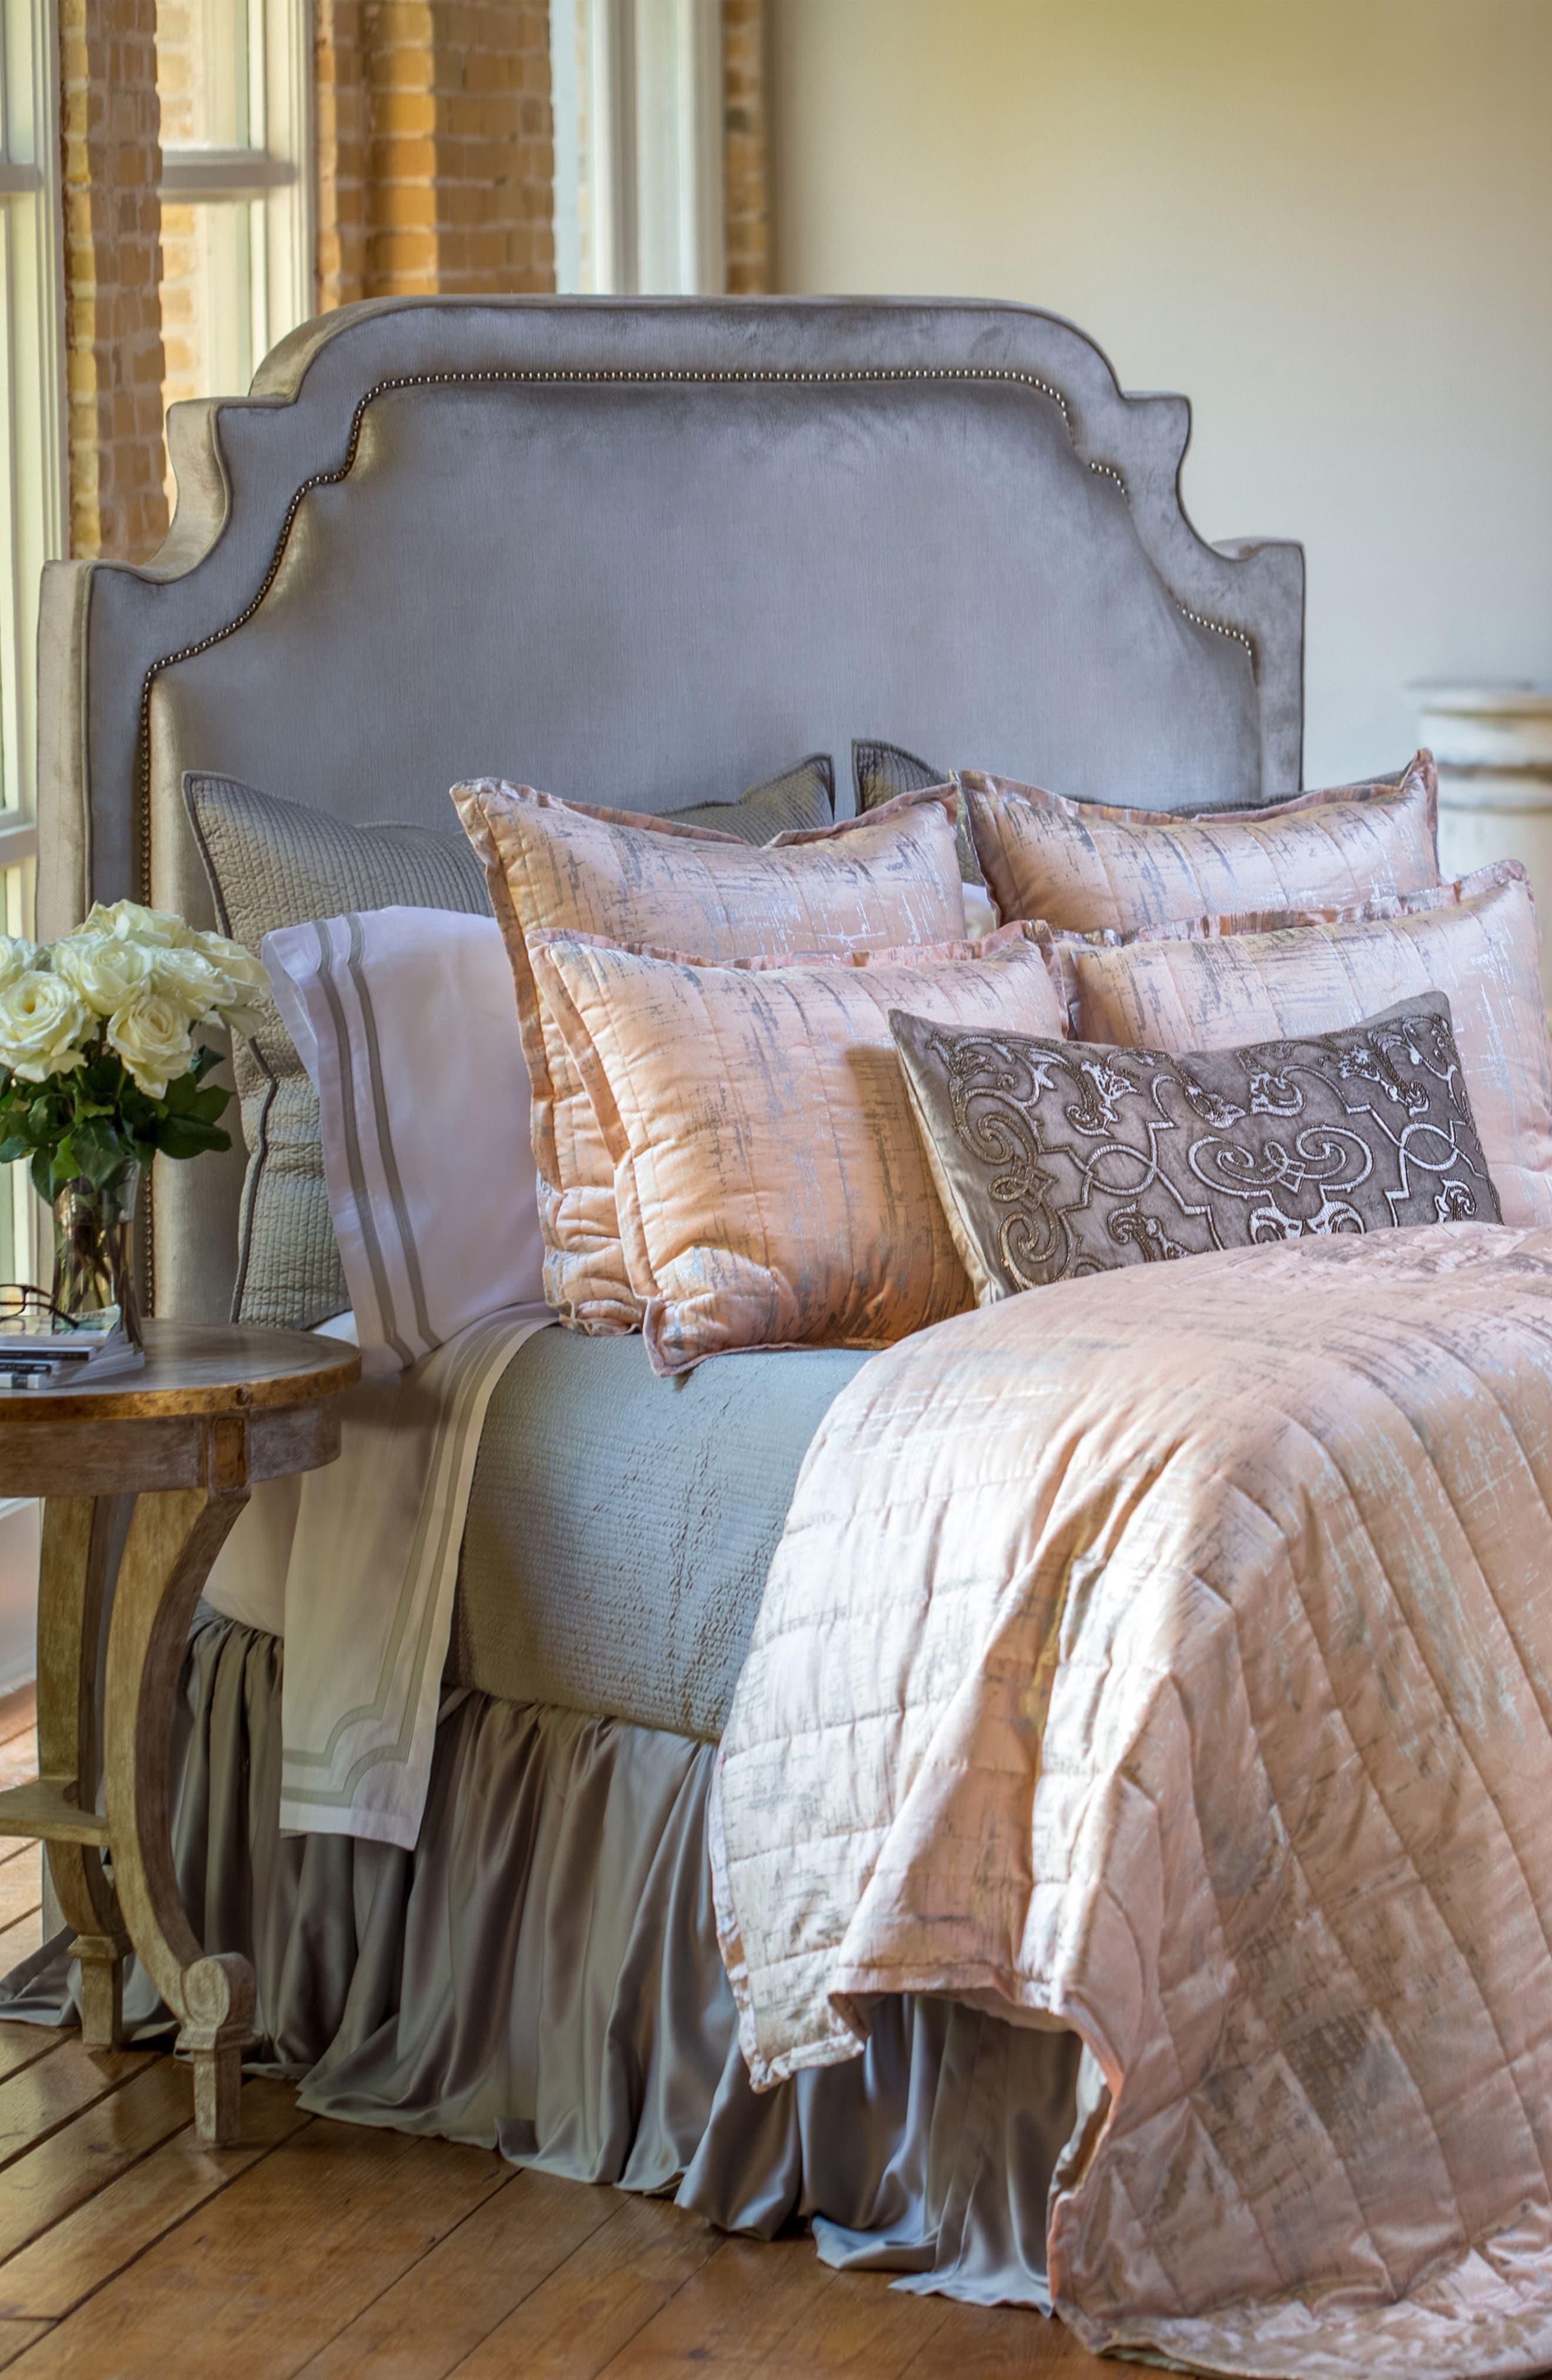 Lili Alessandra Moderne Quilted Blanket